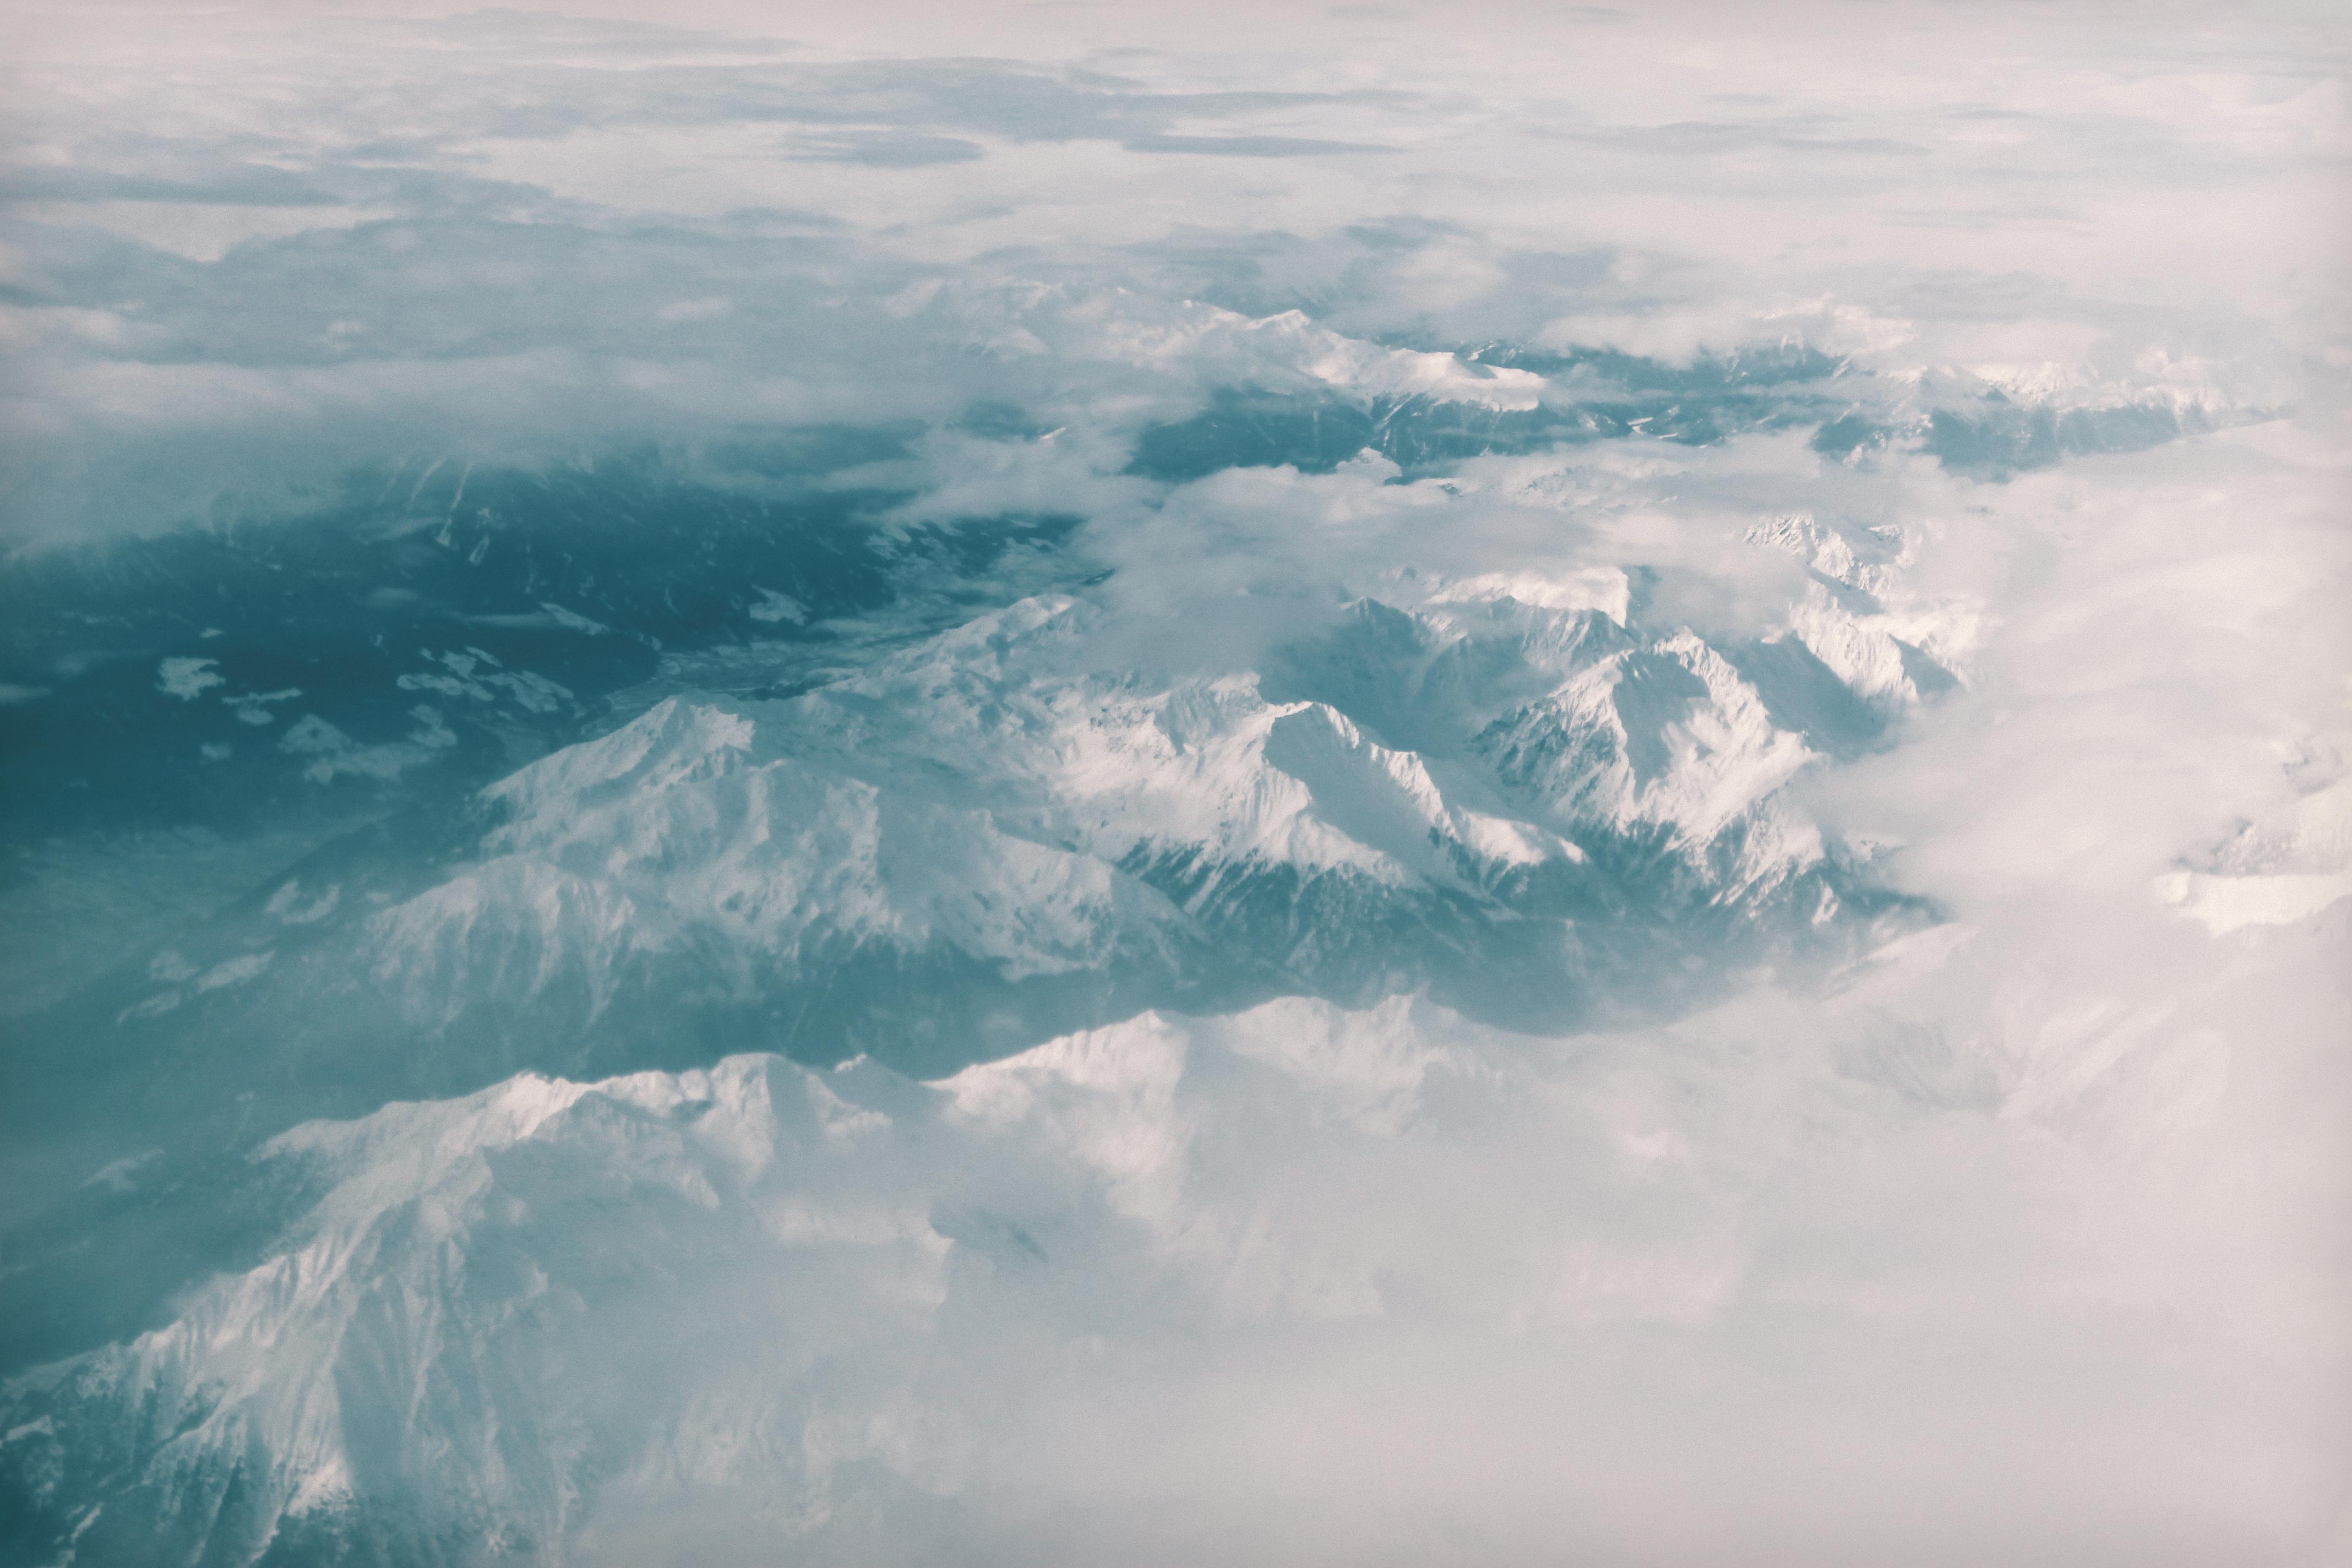 bird's eye view photography of mountain range